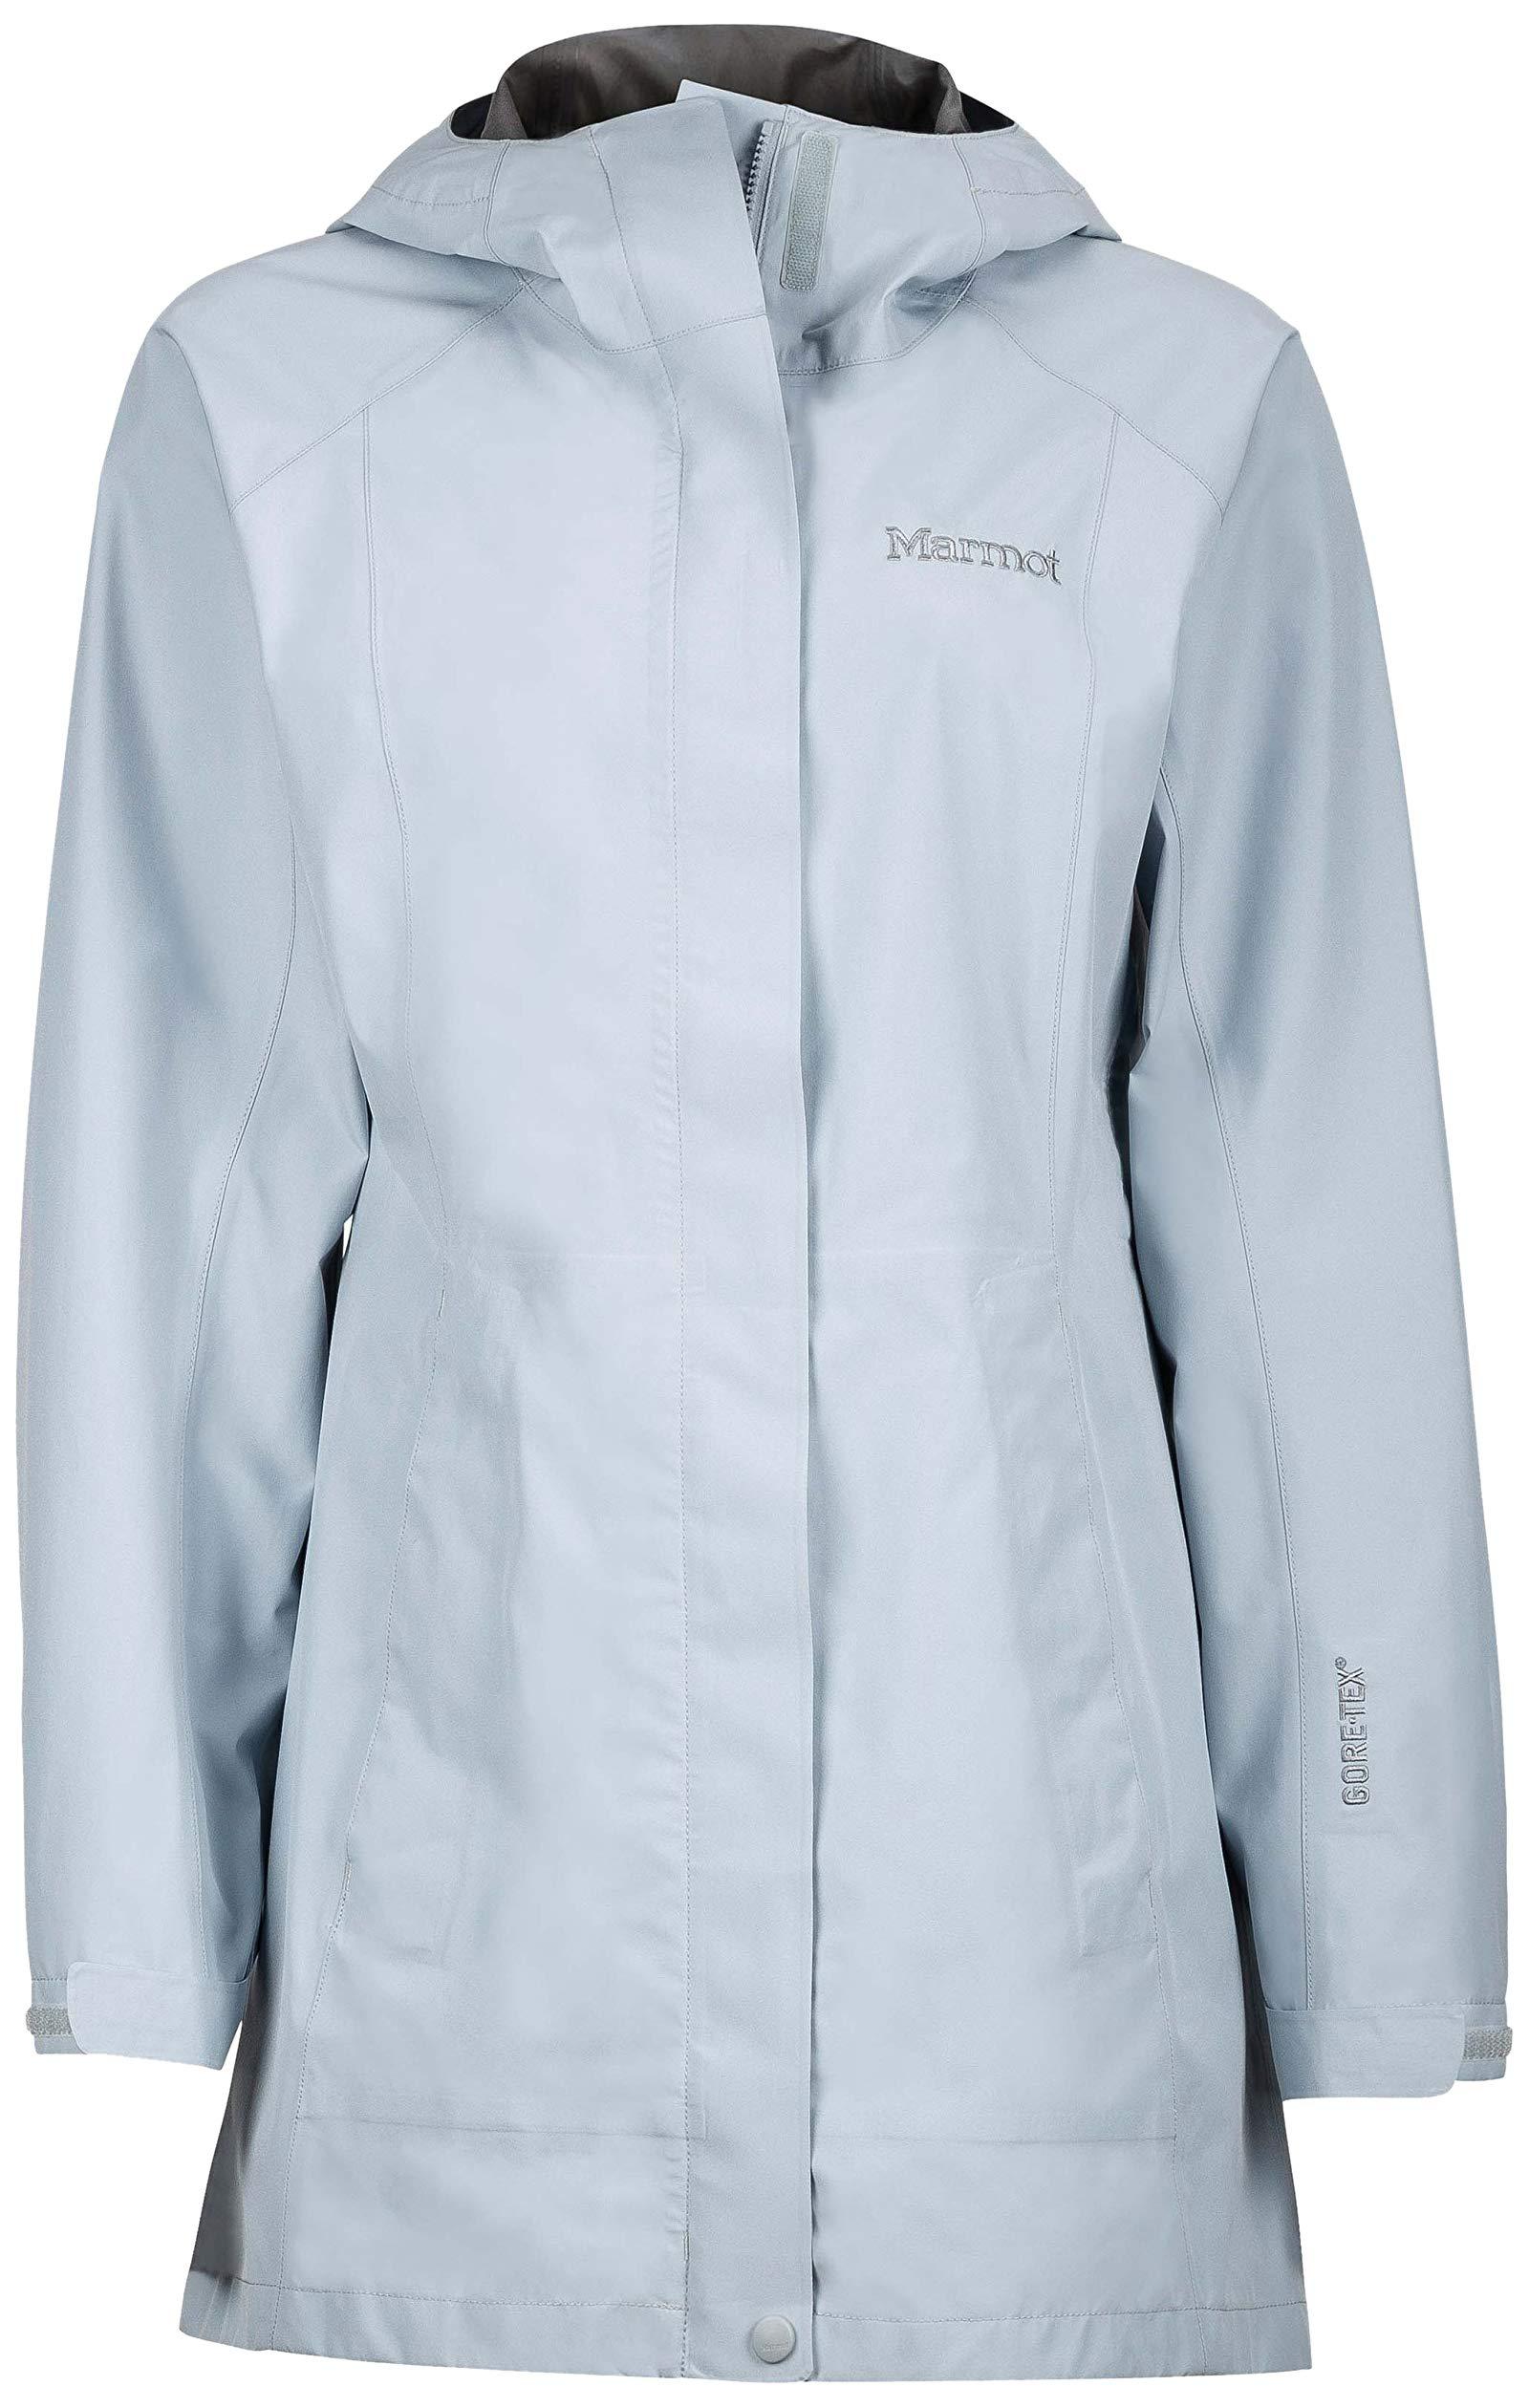 Marmot Essential Women's Lightweight Waterproof Rain Jacket, GORE-TEX with PACLITE Technology, Silver by Marmot